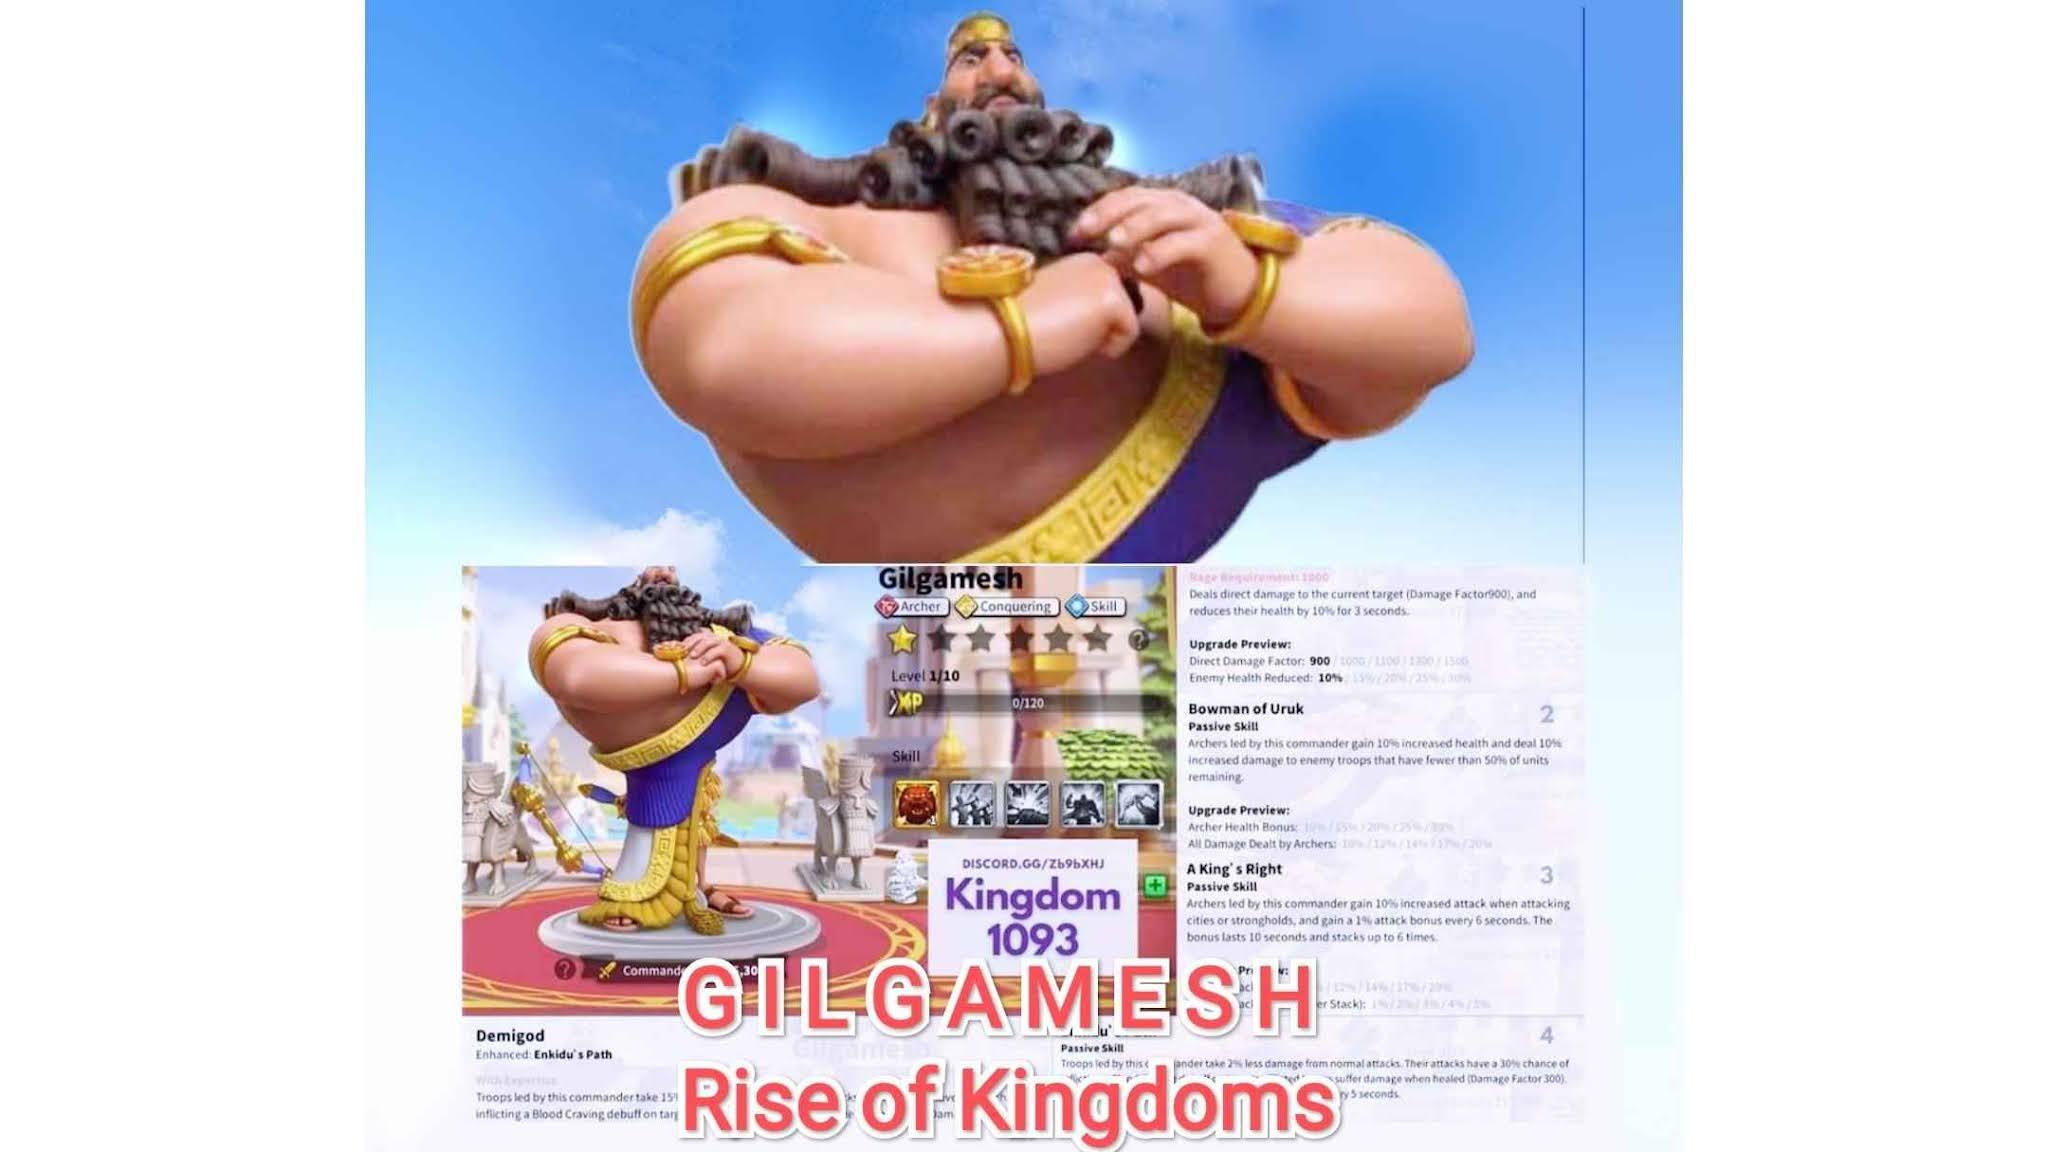 gilgamesh rise of kingdoms pair pasangan